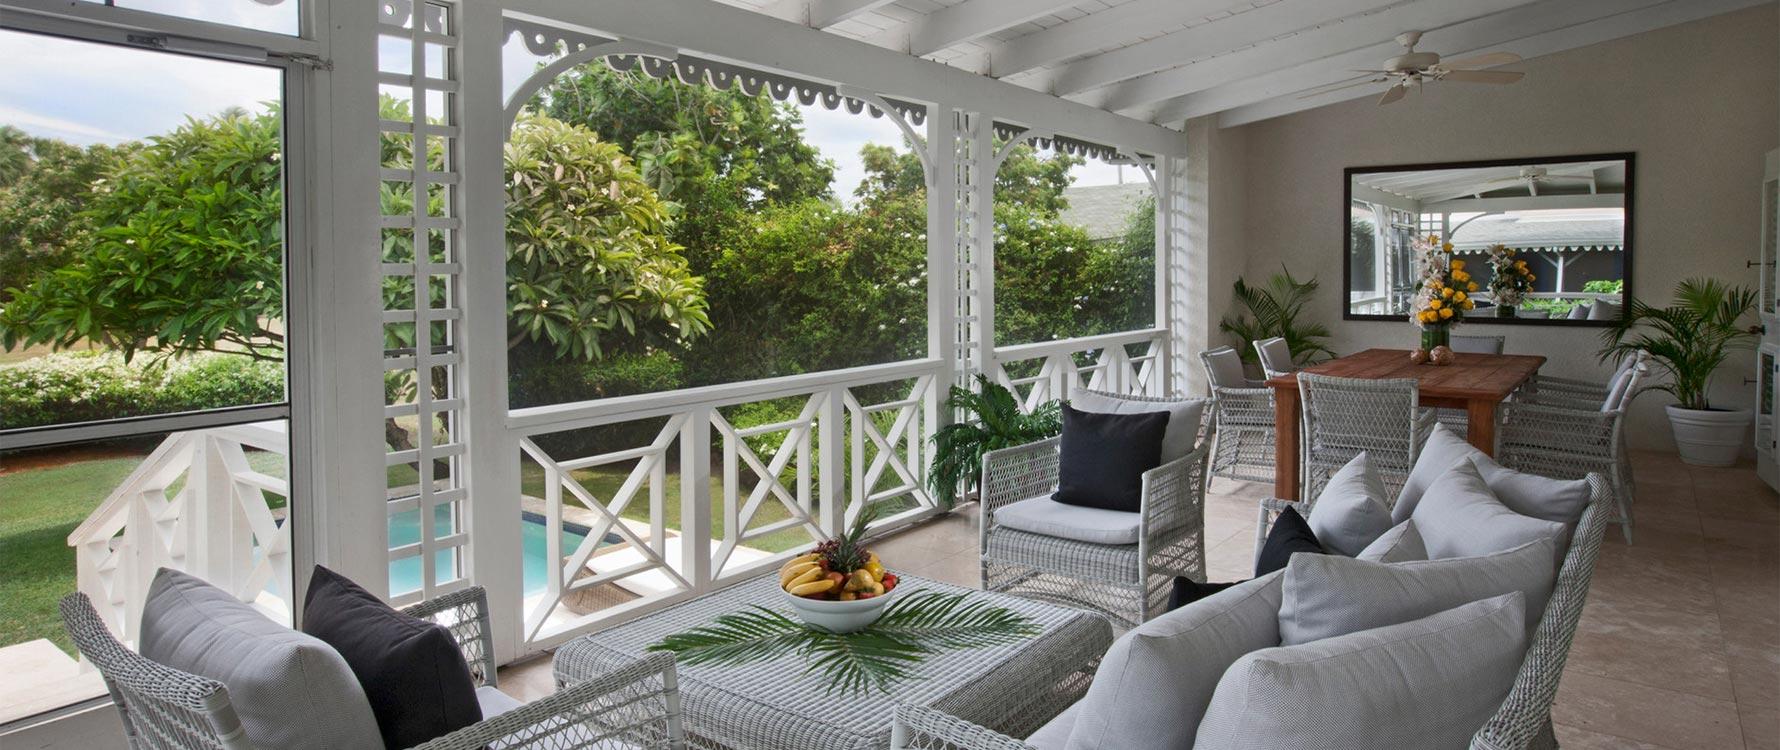 Screened veranda and lounge area